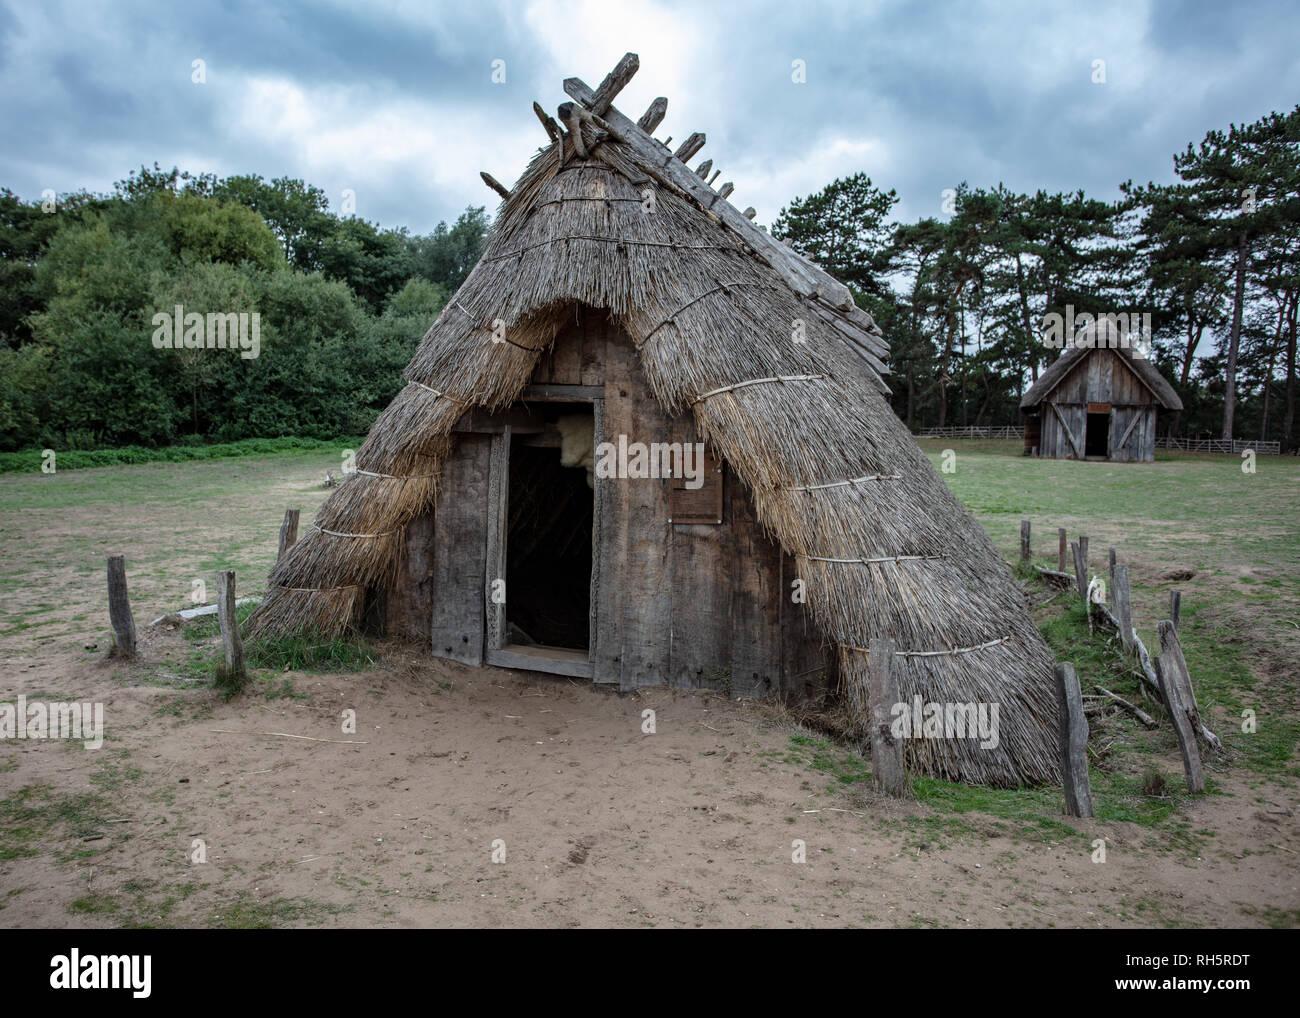 Anglo Saxon Houses Stock Photo